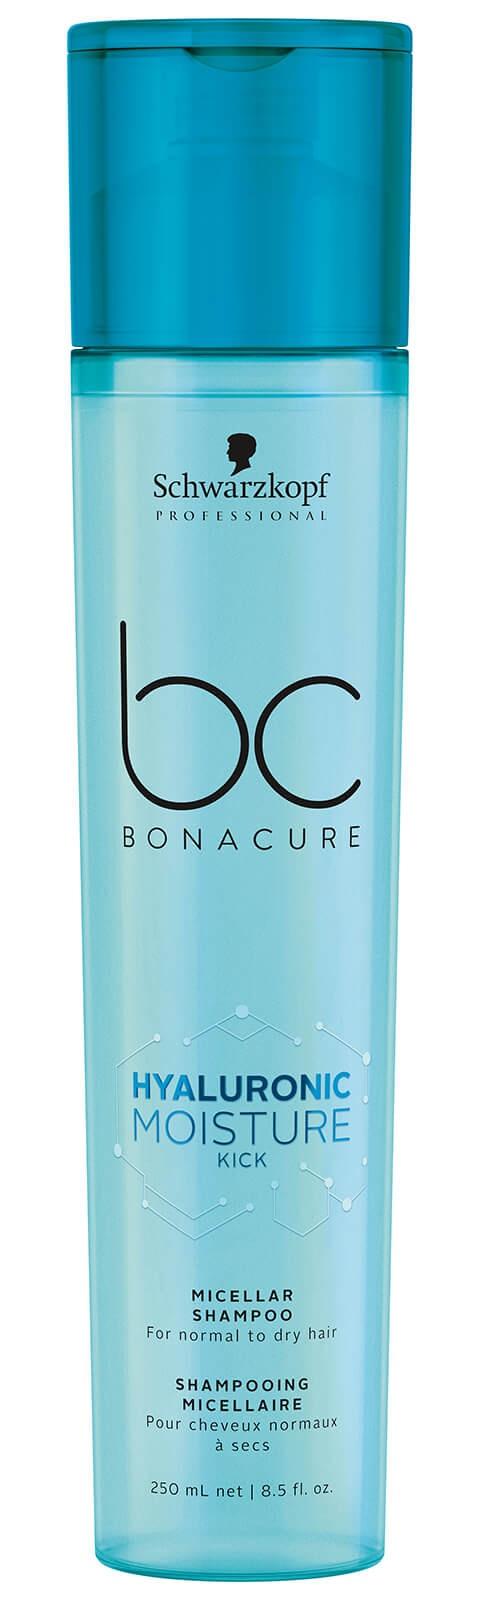 Schwarzkopf Professional BC Bonacure Hyaluronic Moisture Kick Micellar Shampoo